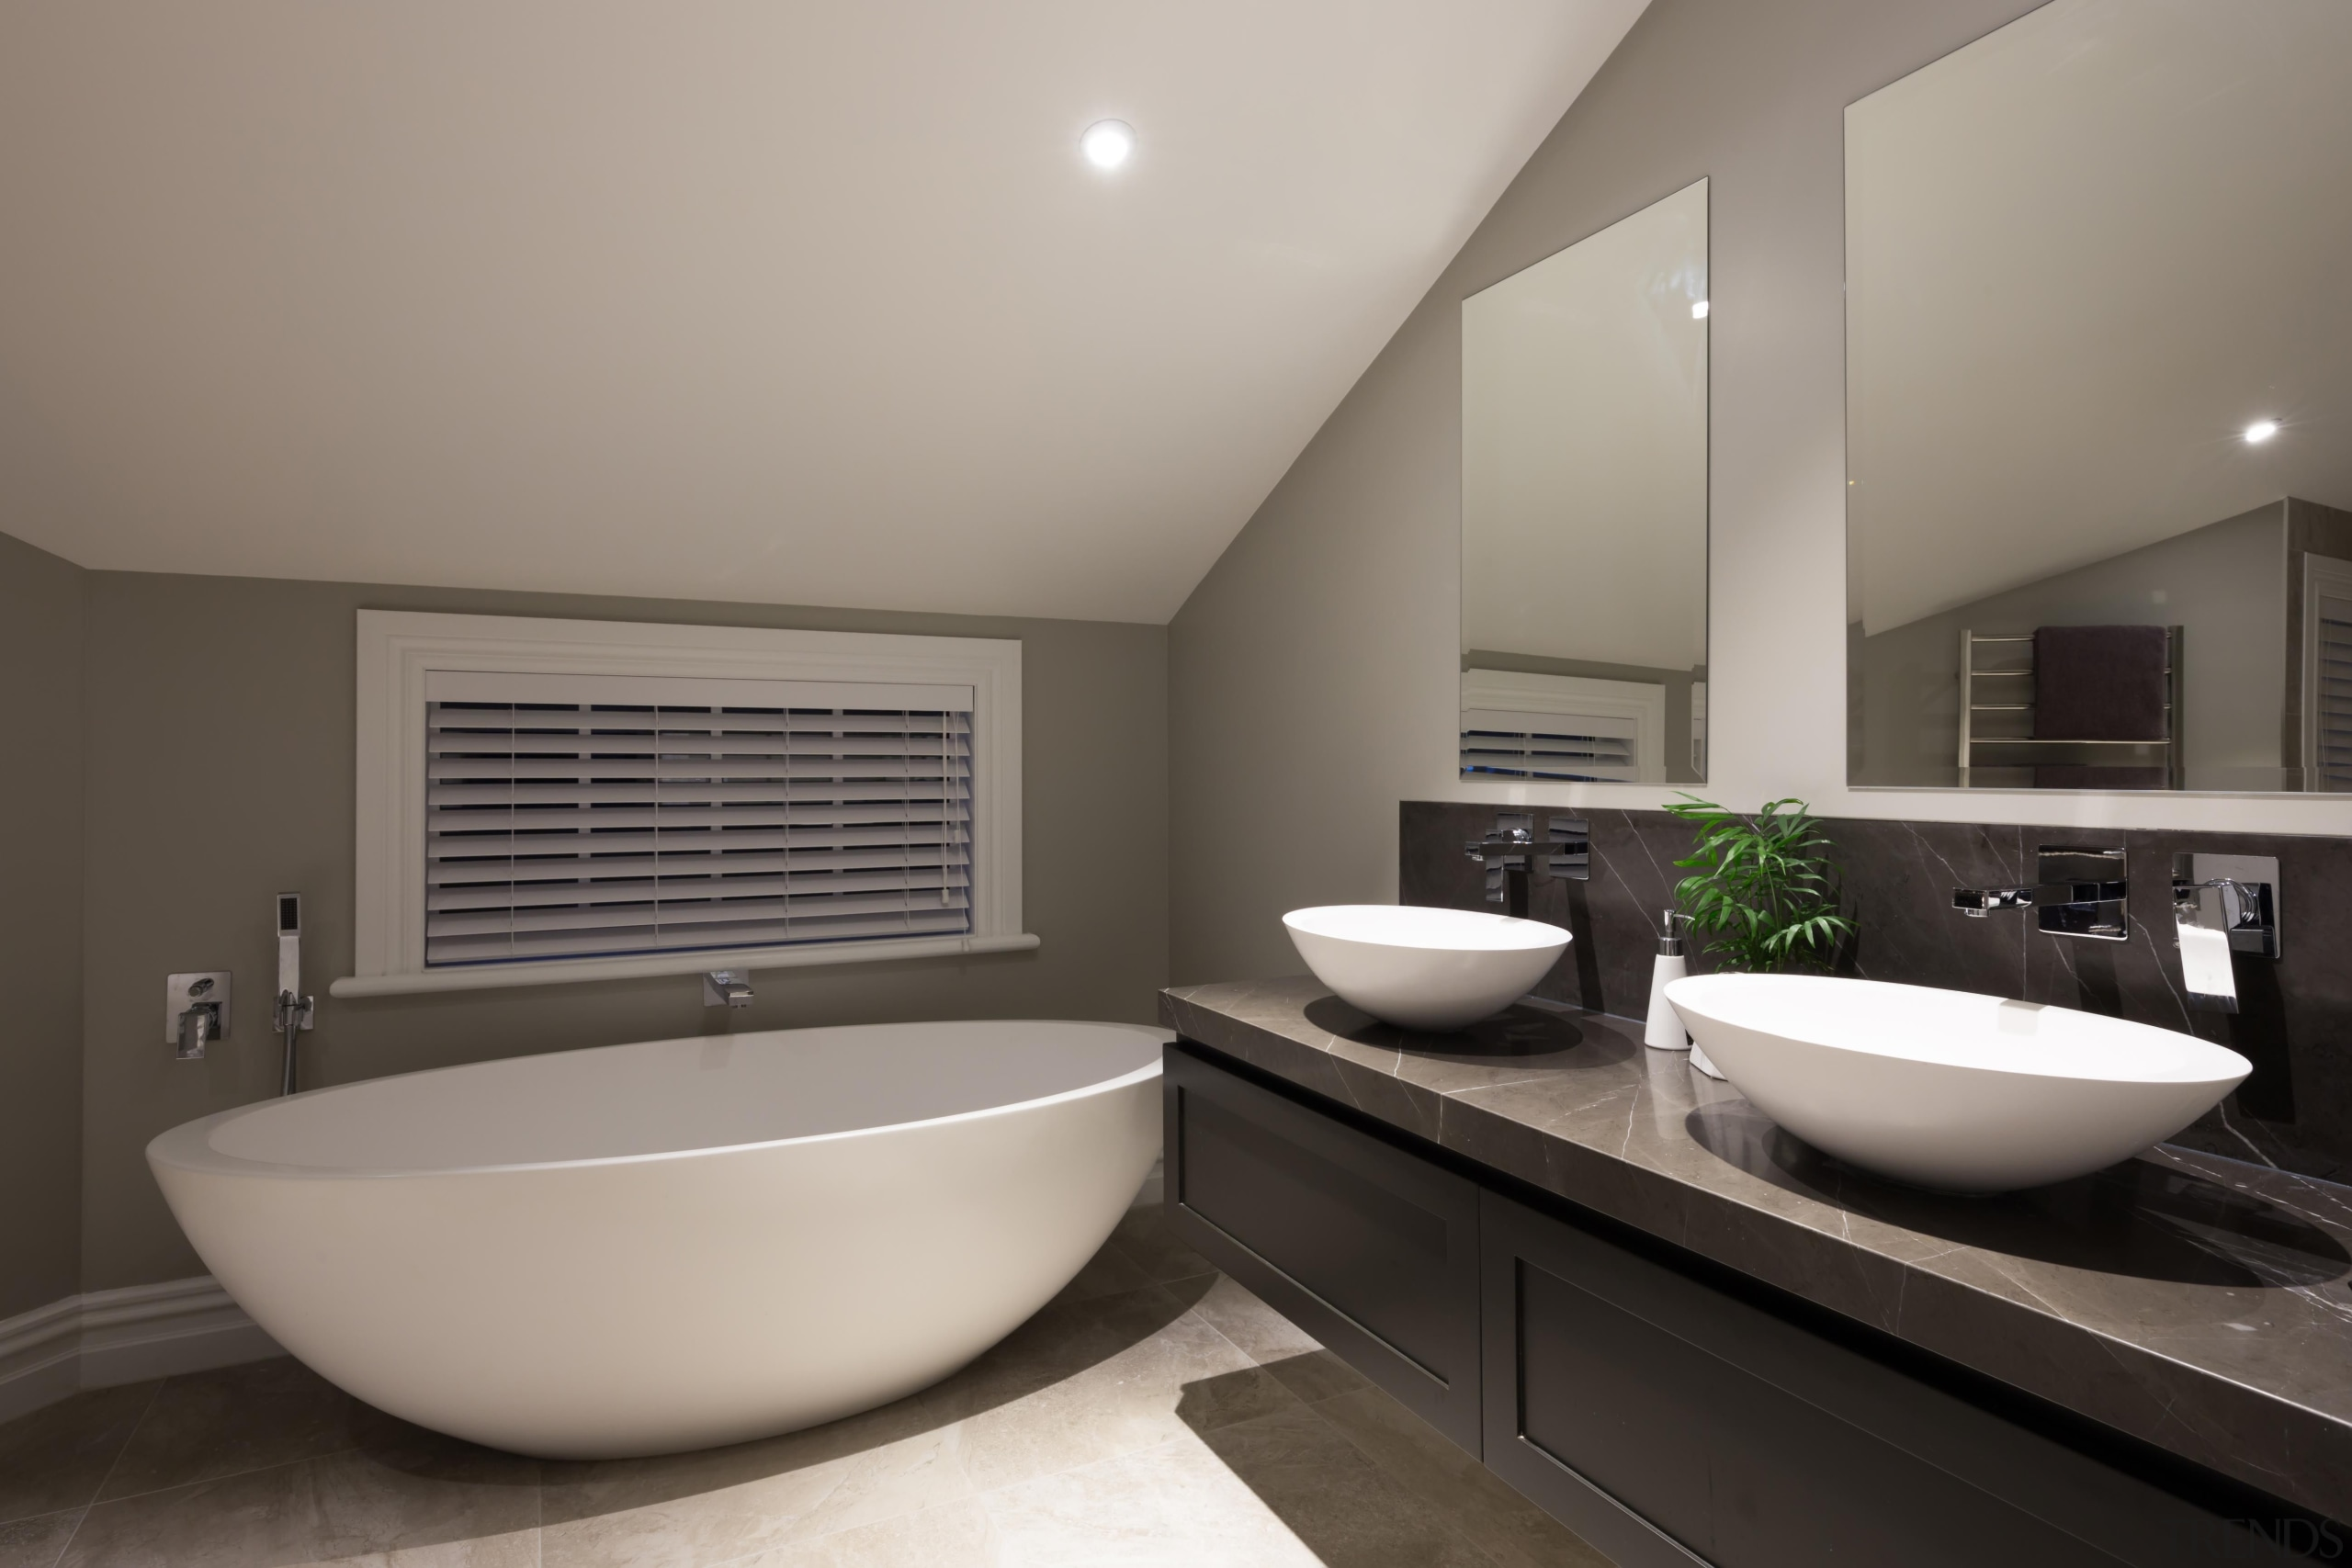 Img9027 - architecture   bathroom   interior design architecture, bathroom, interior design, real estate, room, sink, gray, black